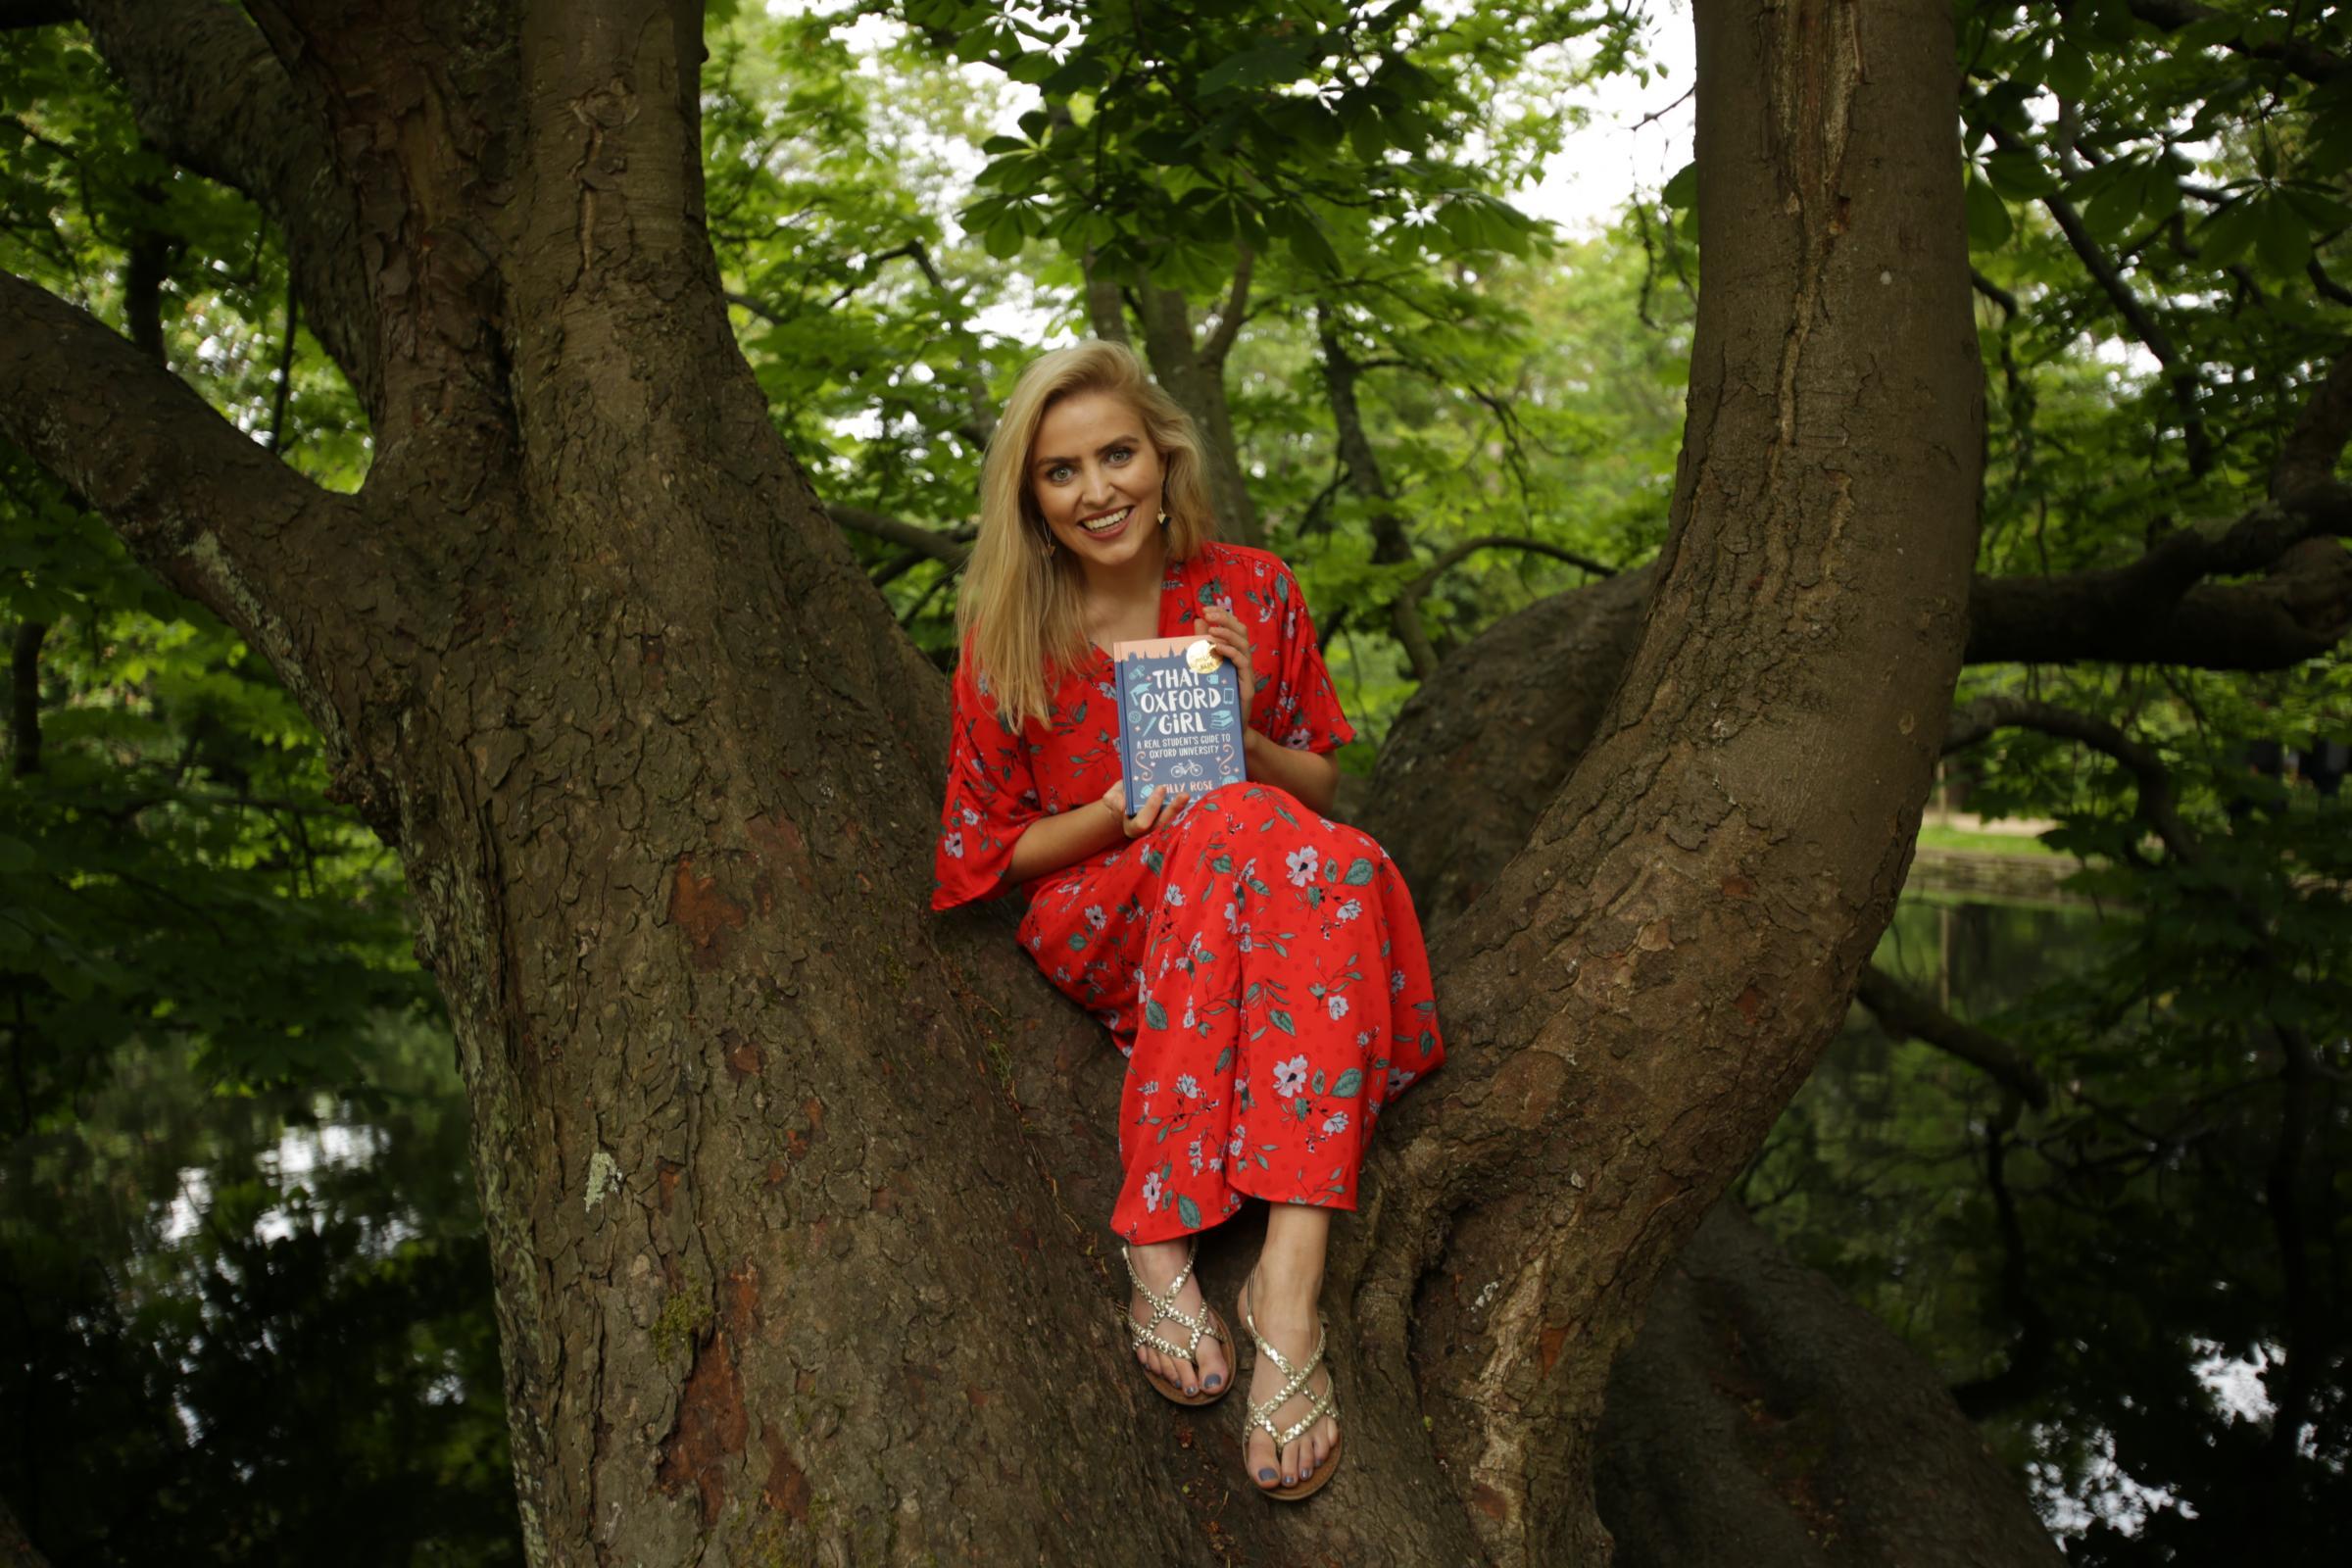 Profile: Instagram's That Oxford Girl, Tilly Rose